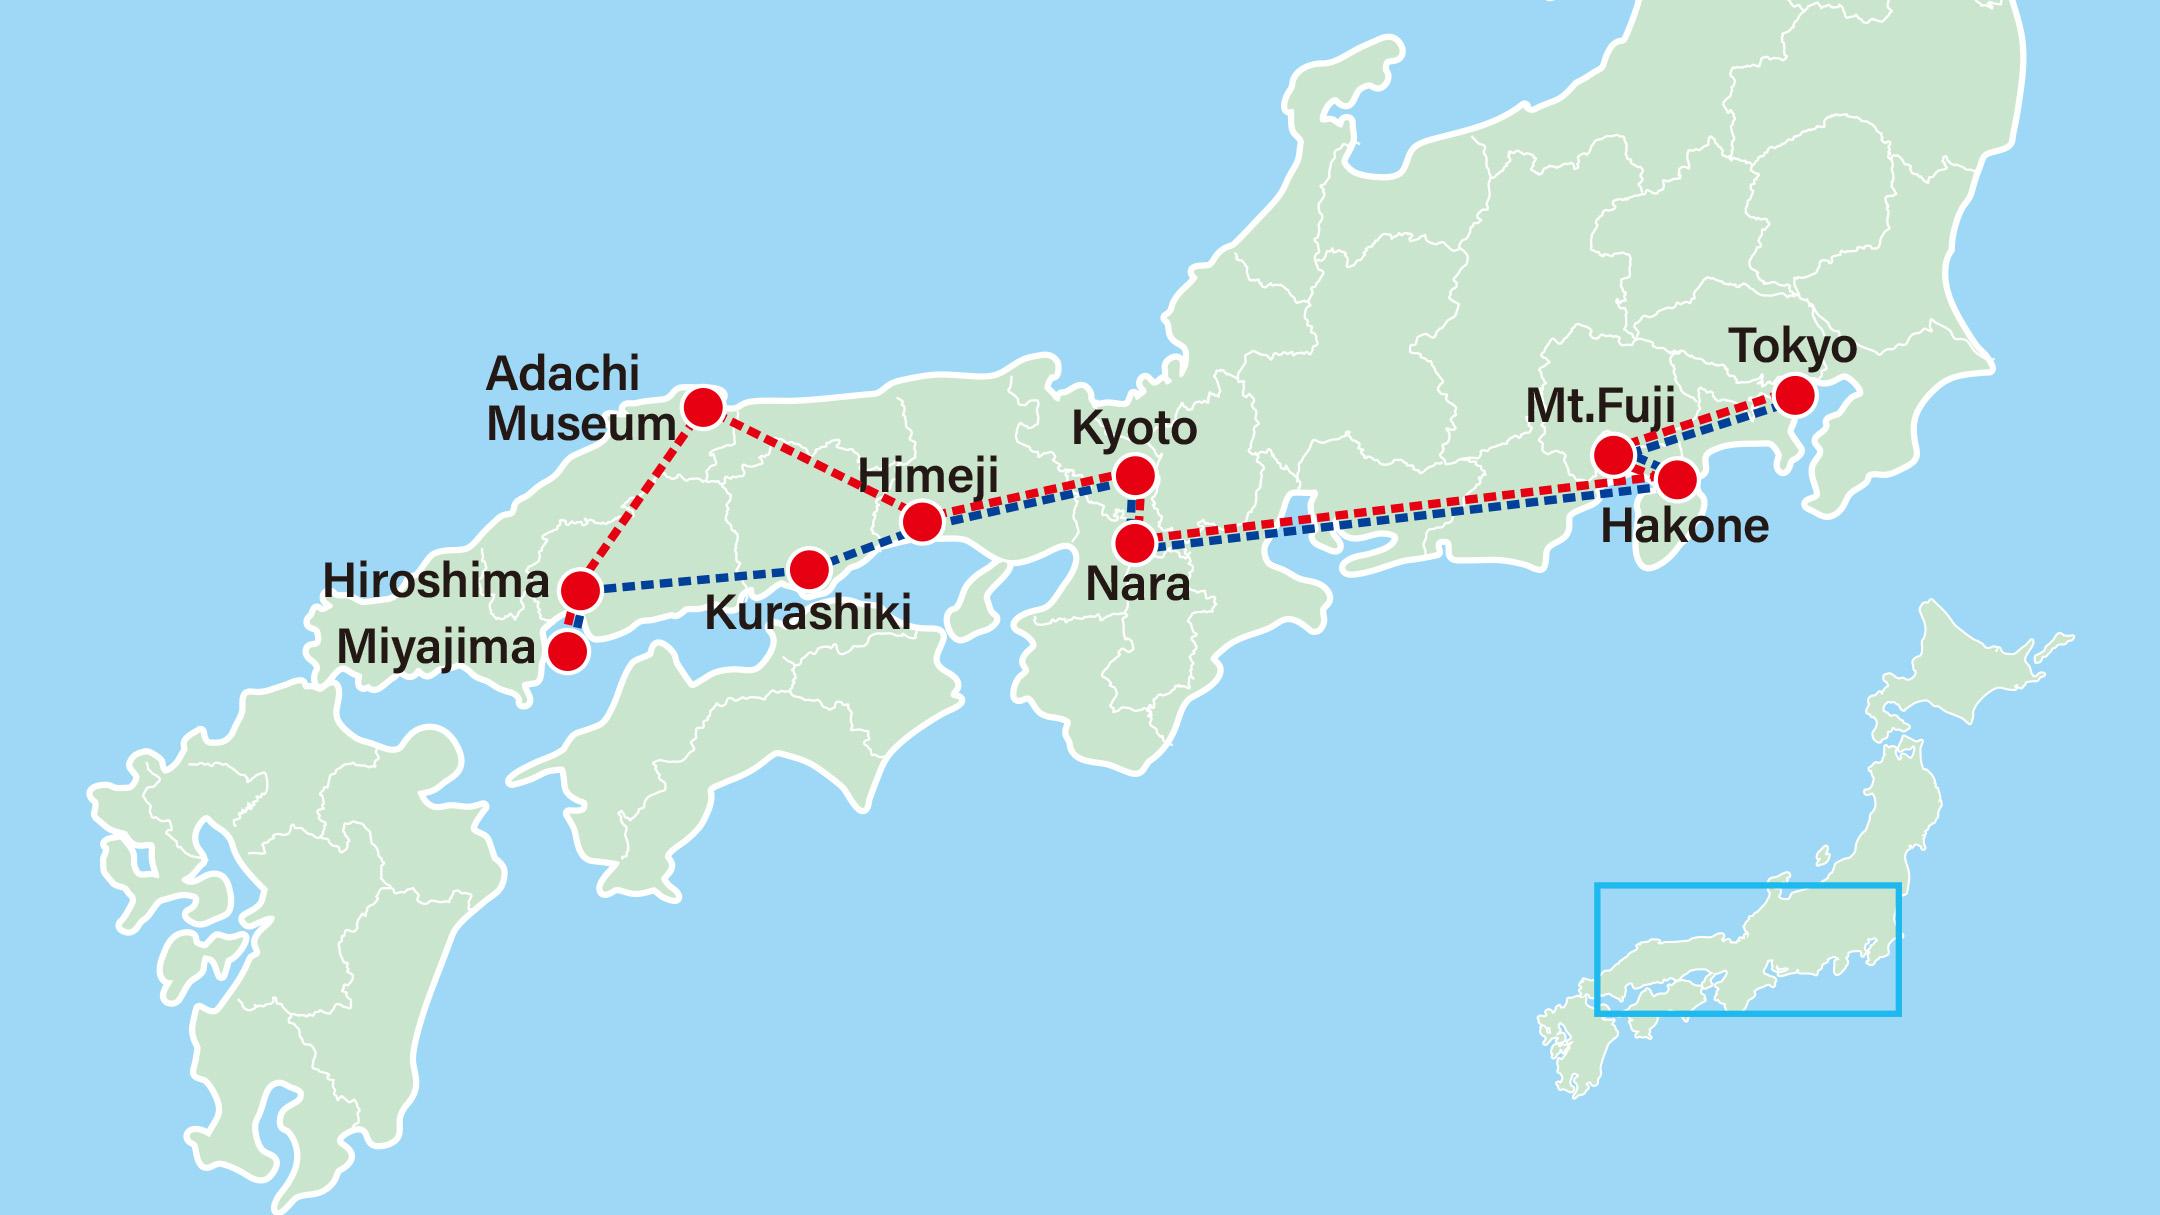 Anime Japan EXPO 2020 11 Days-Tokyo-Yokohama-Mt.Fuji-Hakone-Kyoto-Nara-Himeji-Kurashiki-Hiroshima-Miyajima